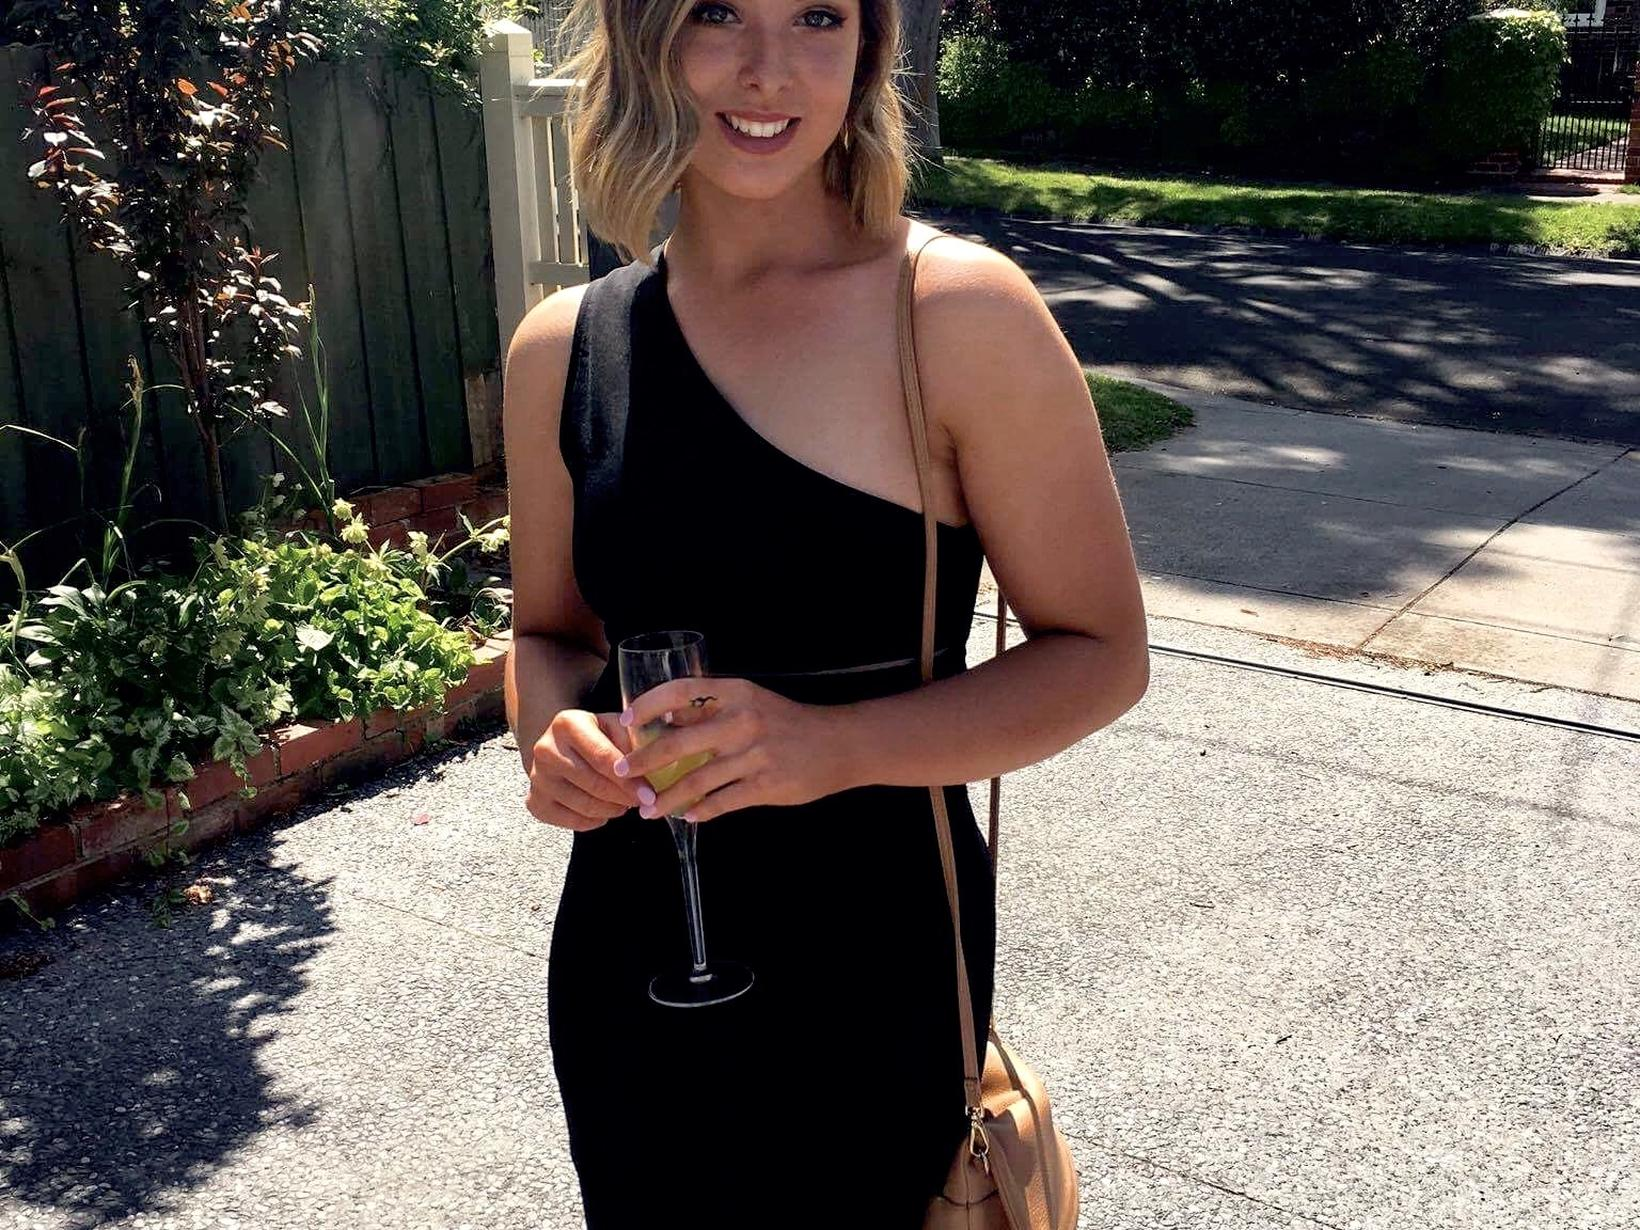 Stephanie from Melbourne, Victoria, Australia